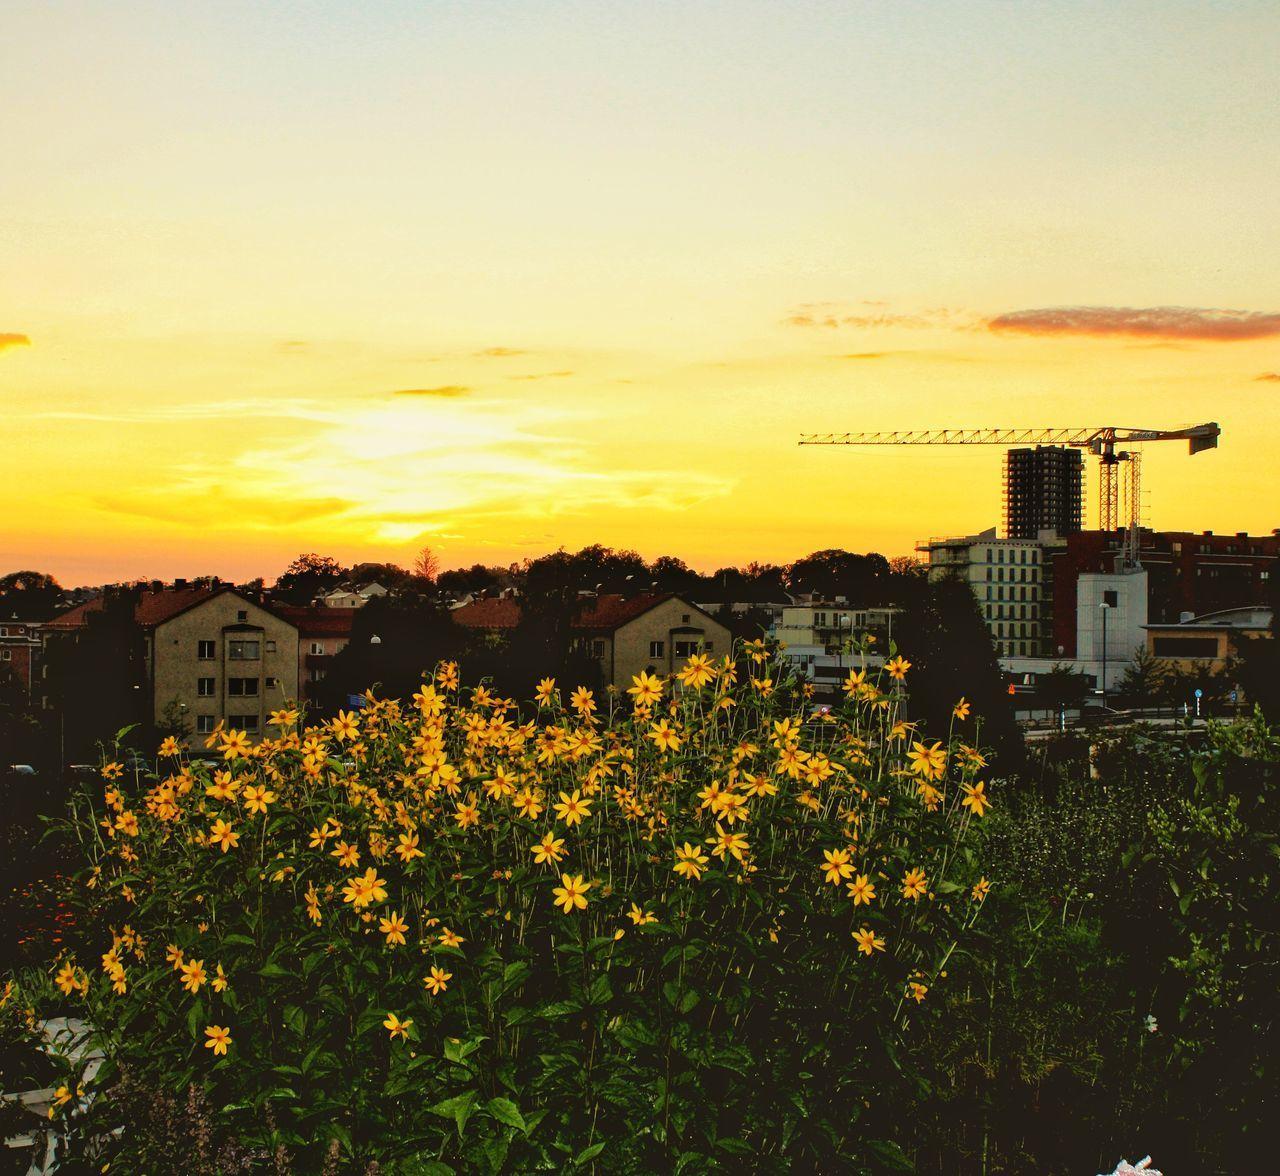 SCENIC VIEW OF YELLOW AND ORANGE SKY